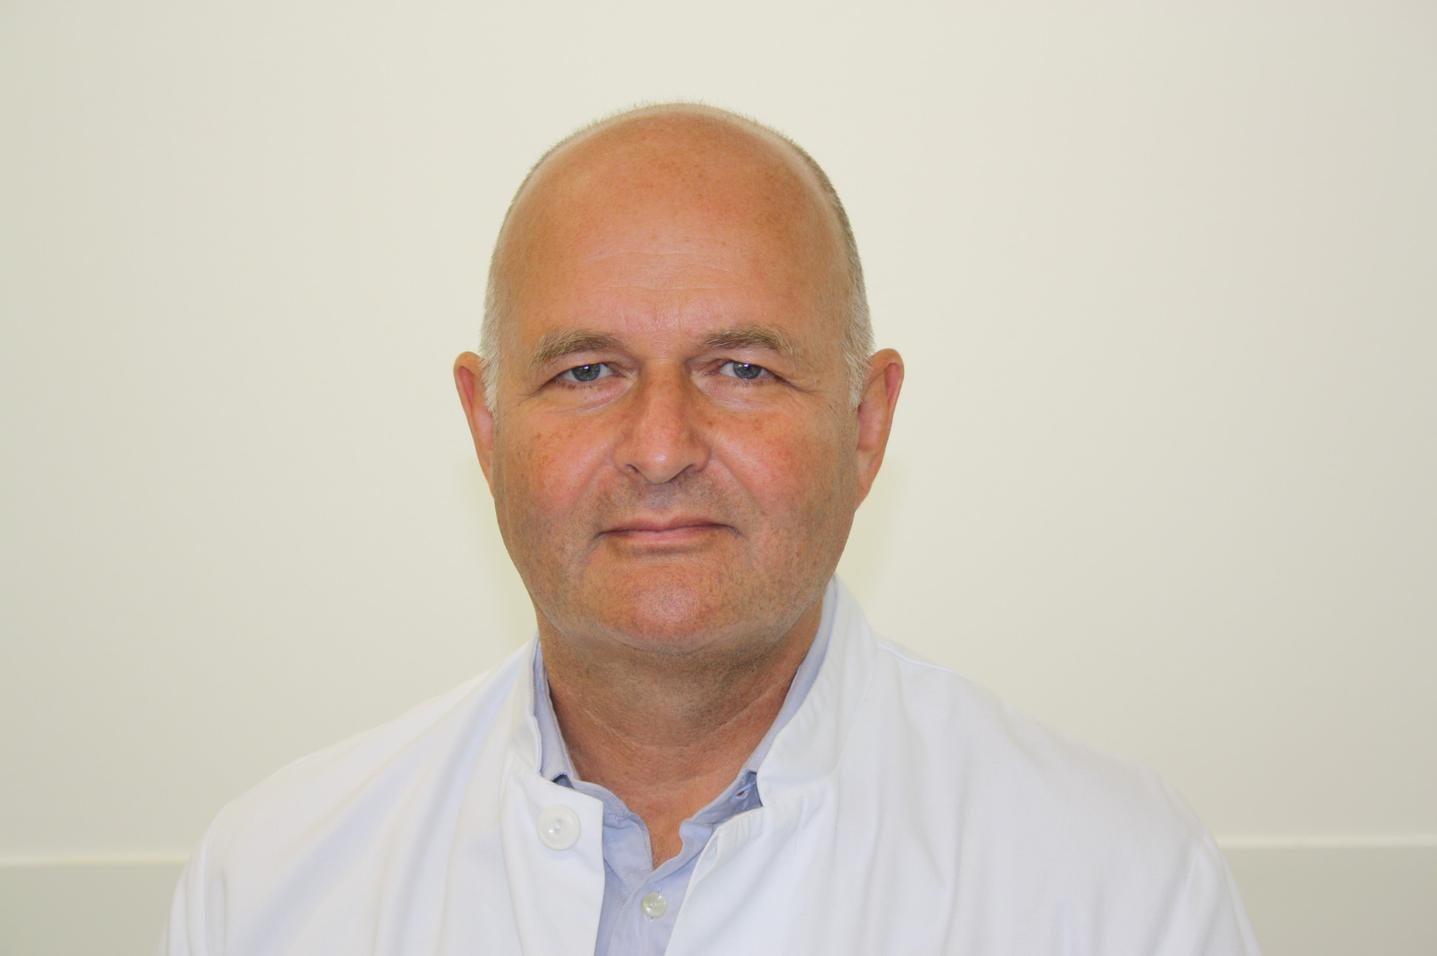 Klaus Hallfeldt